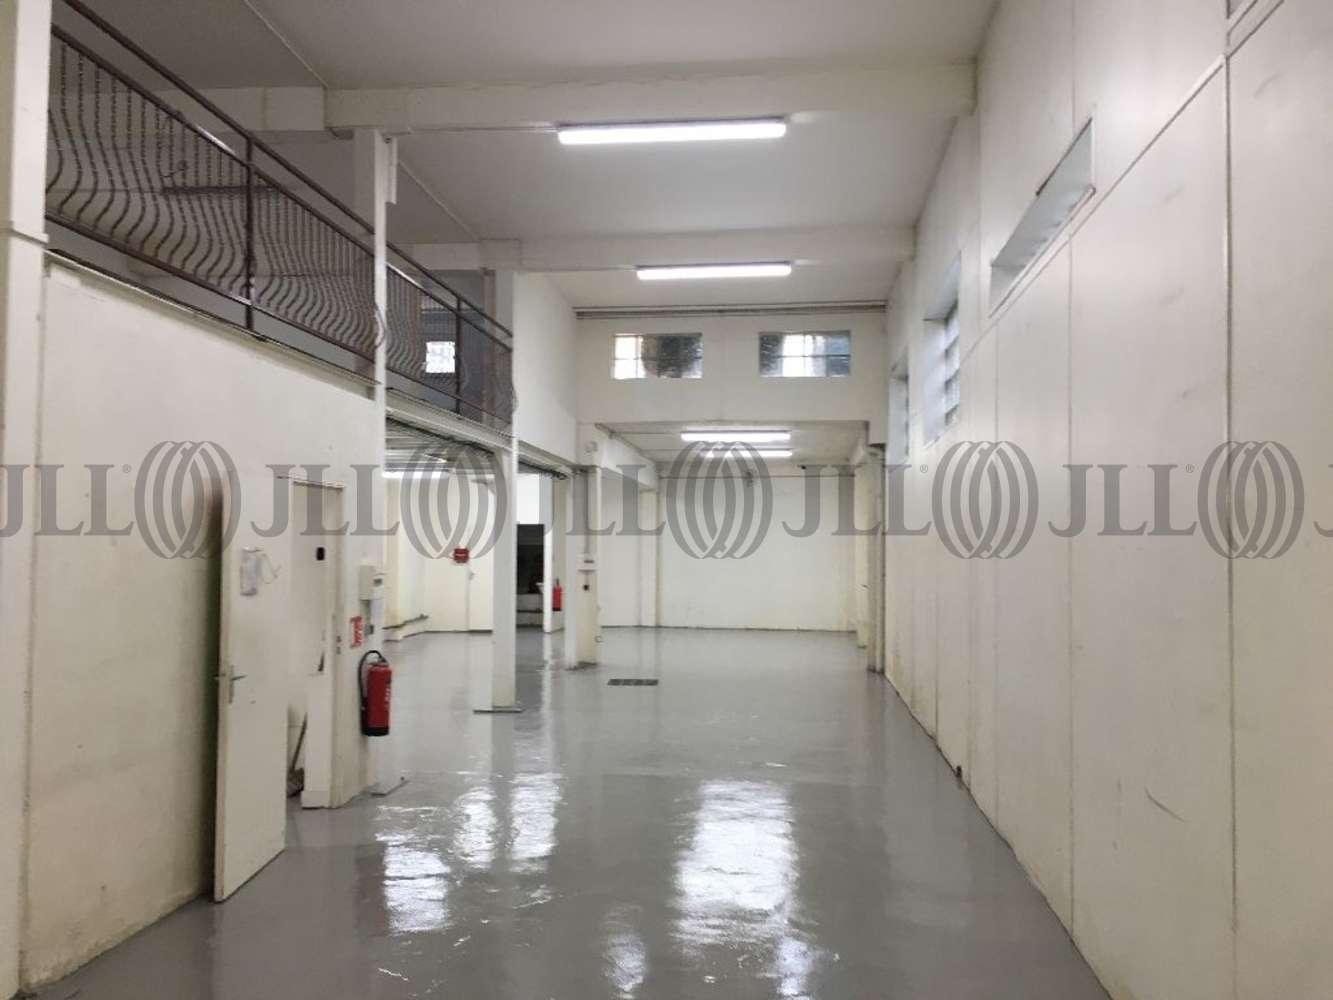 Activités/entrepôt Clamart, 92140